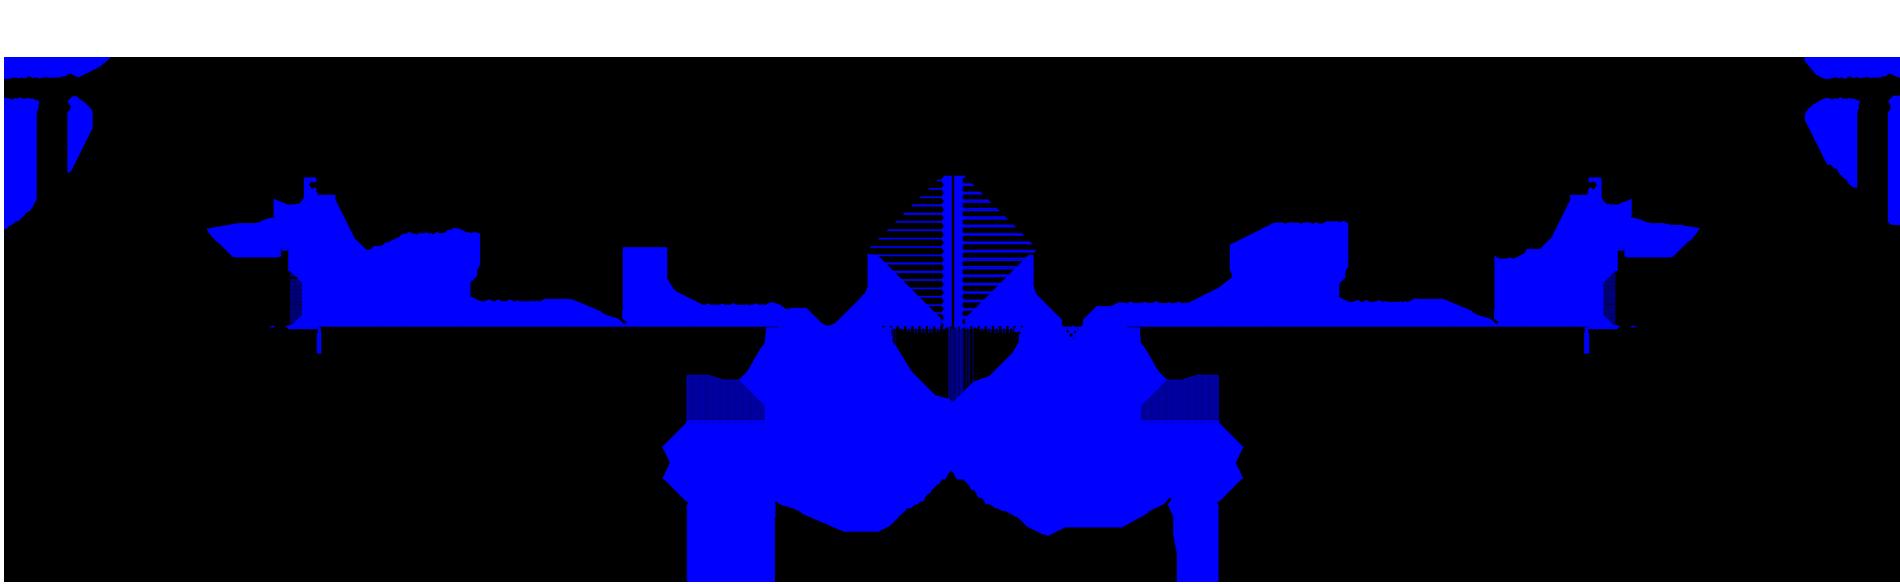 generic-hushcore-whisper-e-system-rtu-curb-acoustical-system